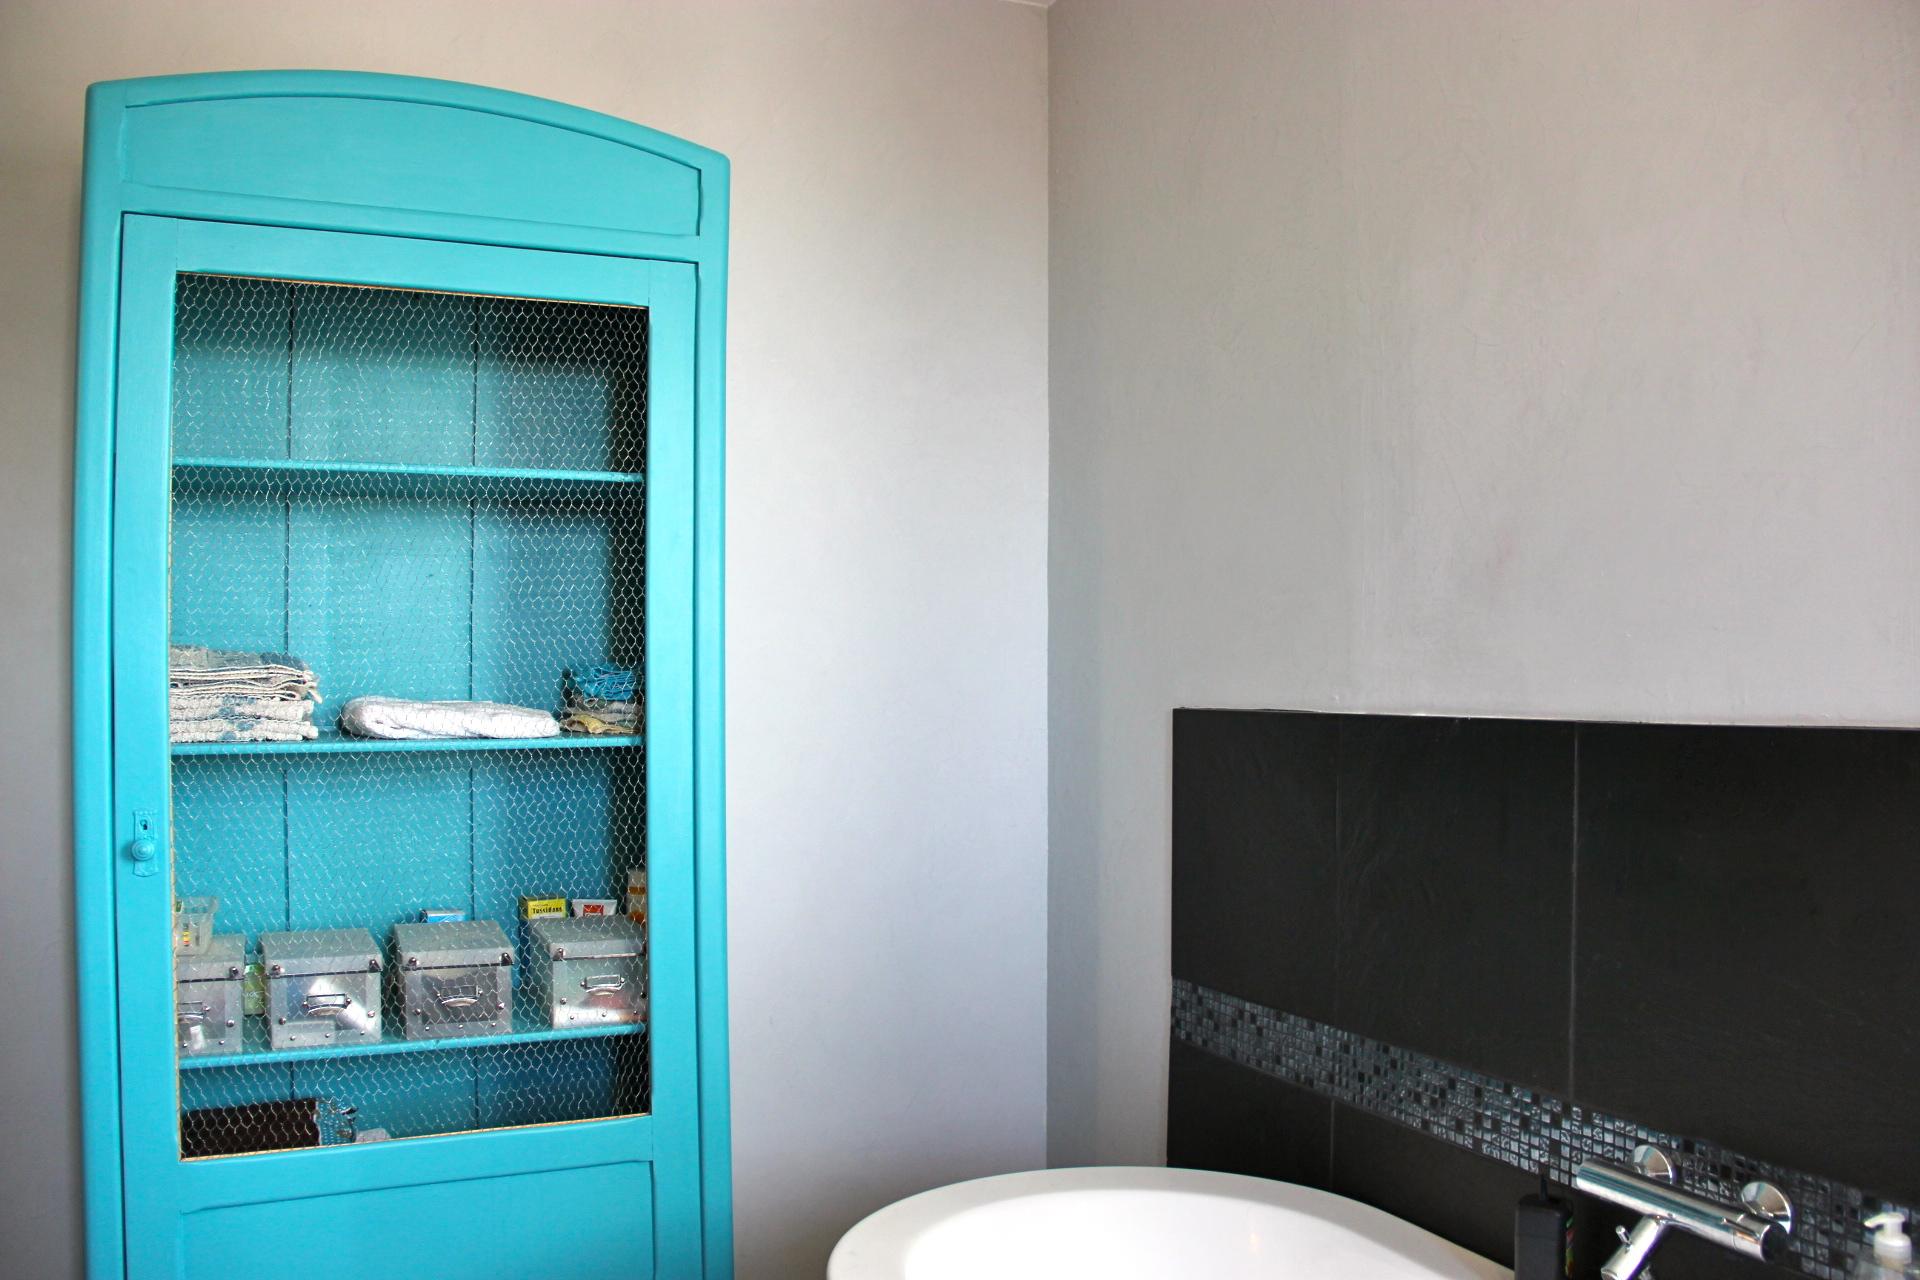 Toilettes for Poncer une porte